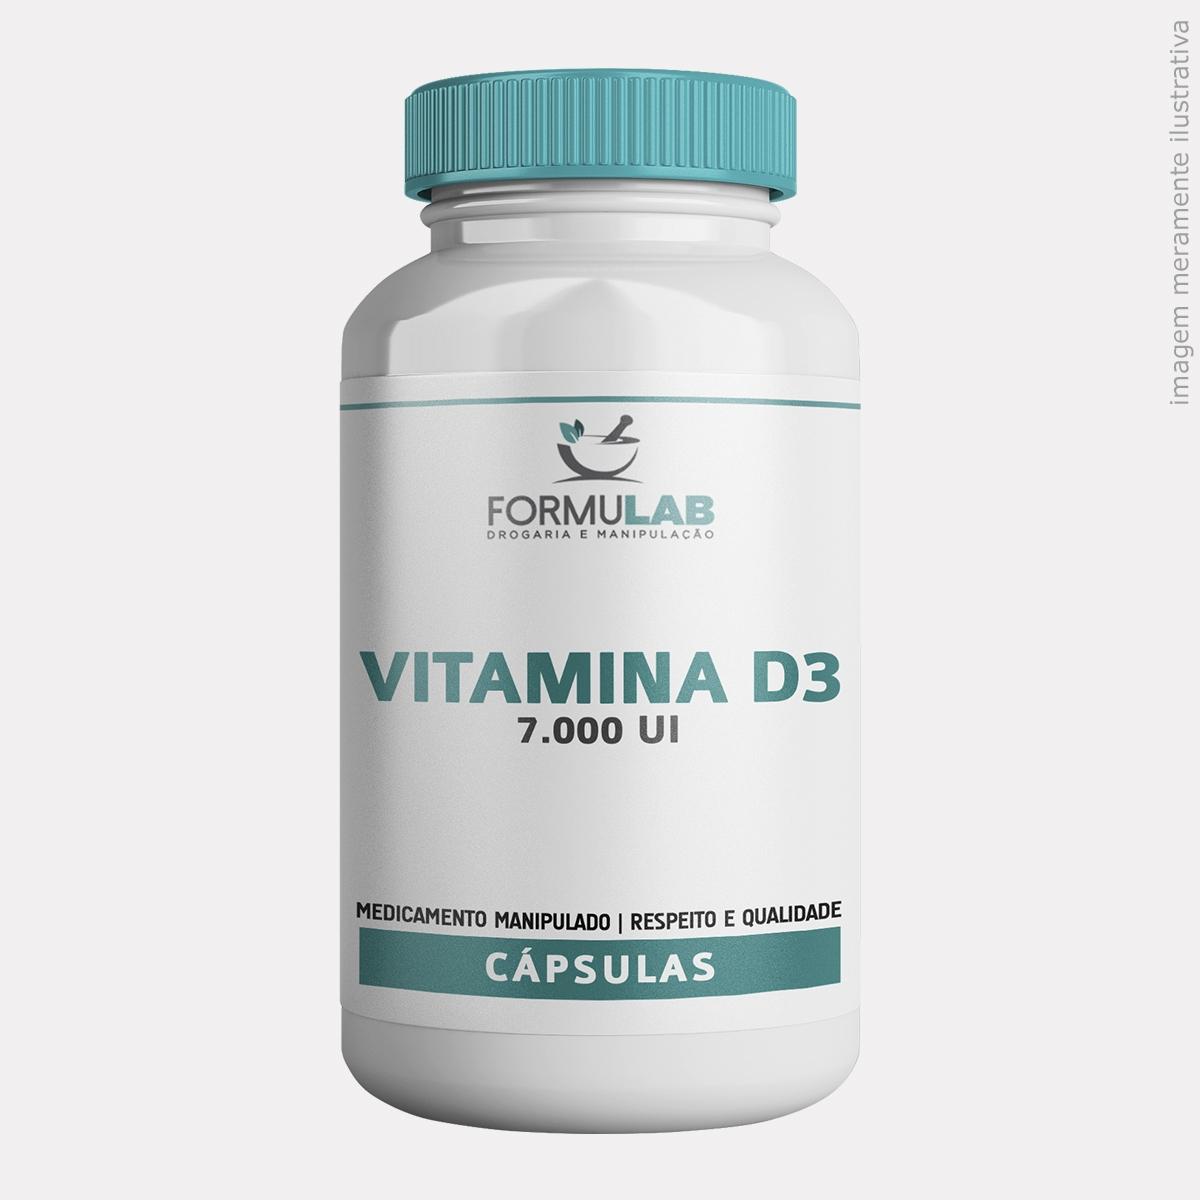 Vitamina D3 7.000 UI - Colecalciferol 7000ui